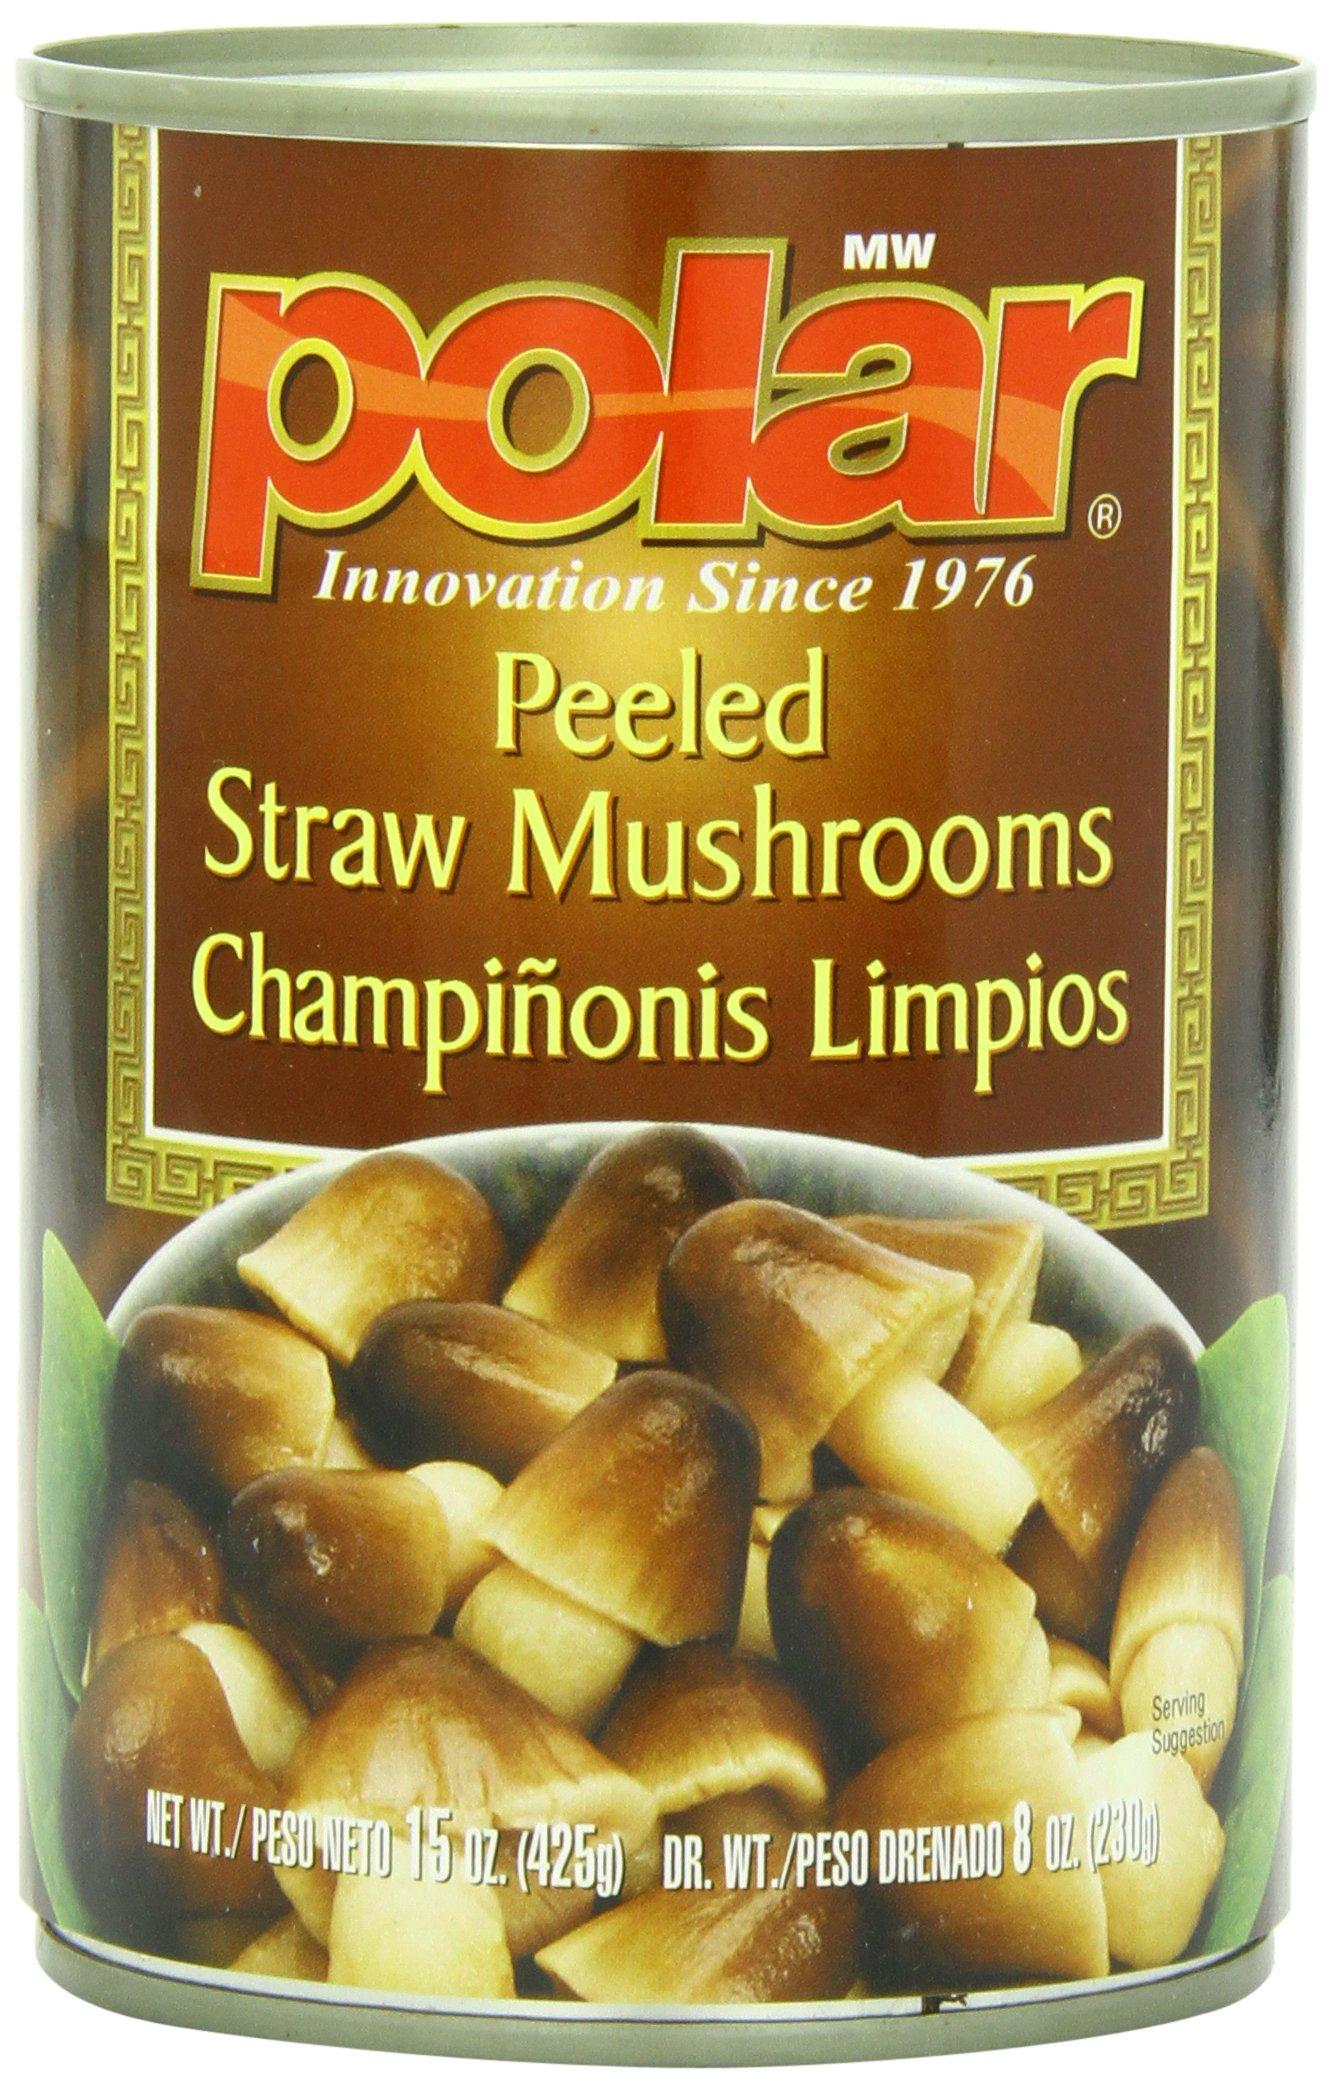 MW Polar Mushrooms, Peeled Straw Mushrooms, 15-Ounce (Pack of 12)